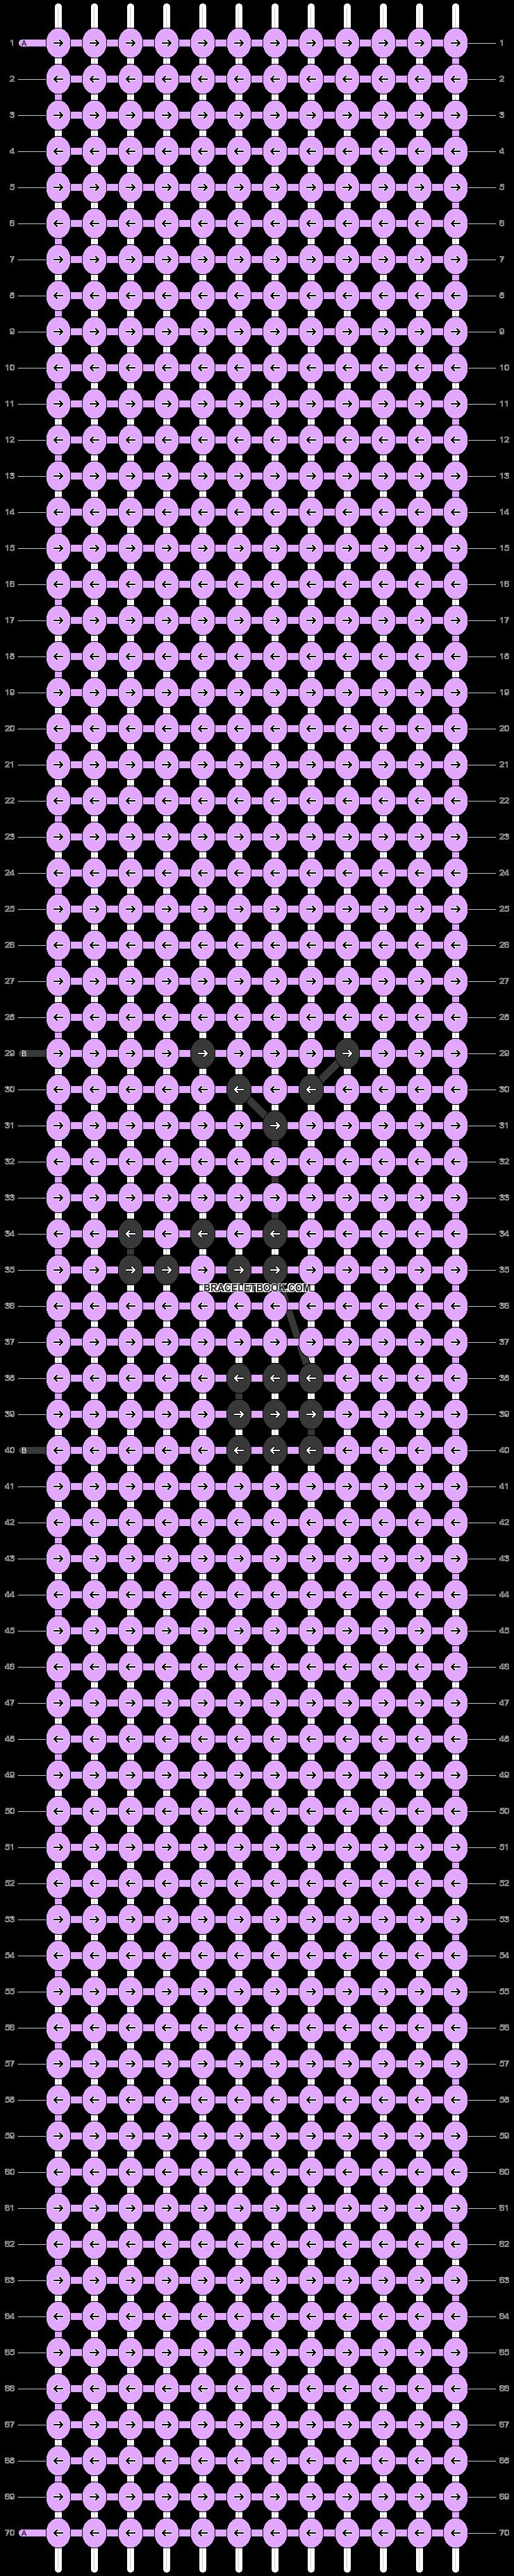 Alpha pattern #49164 pattern